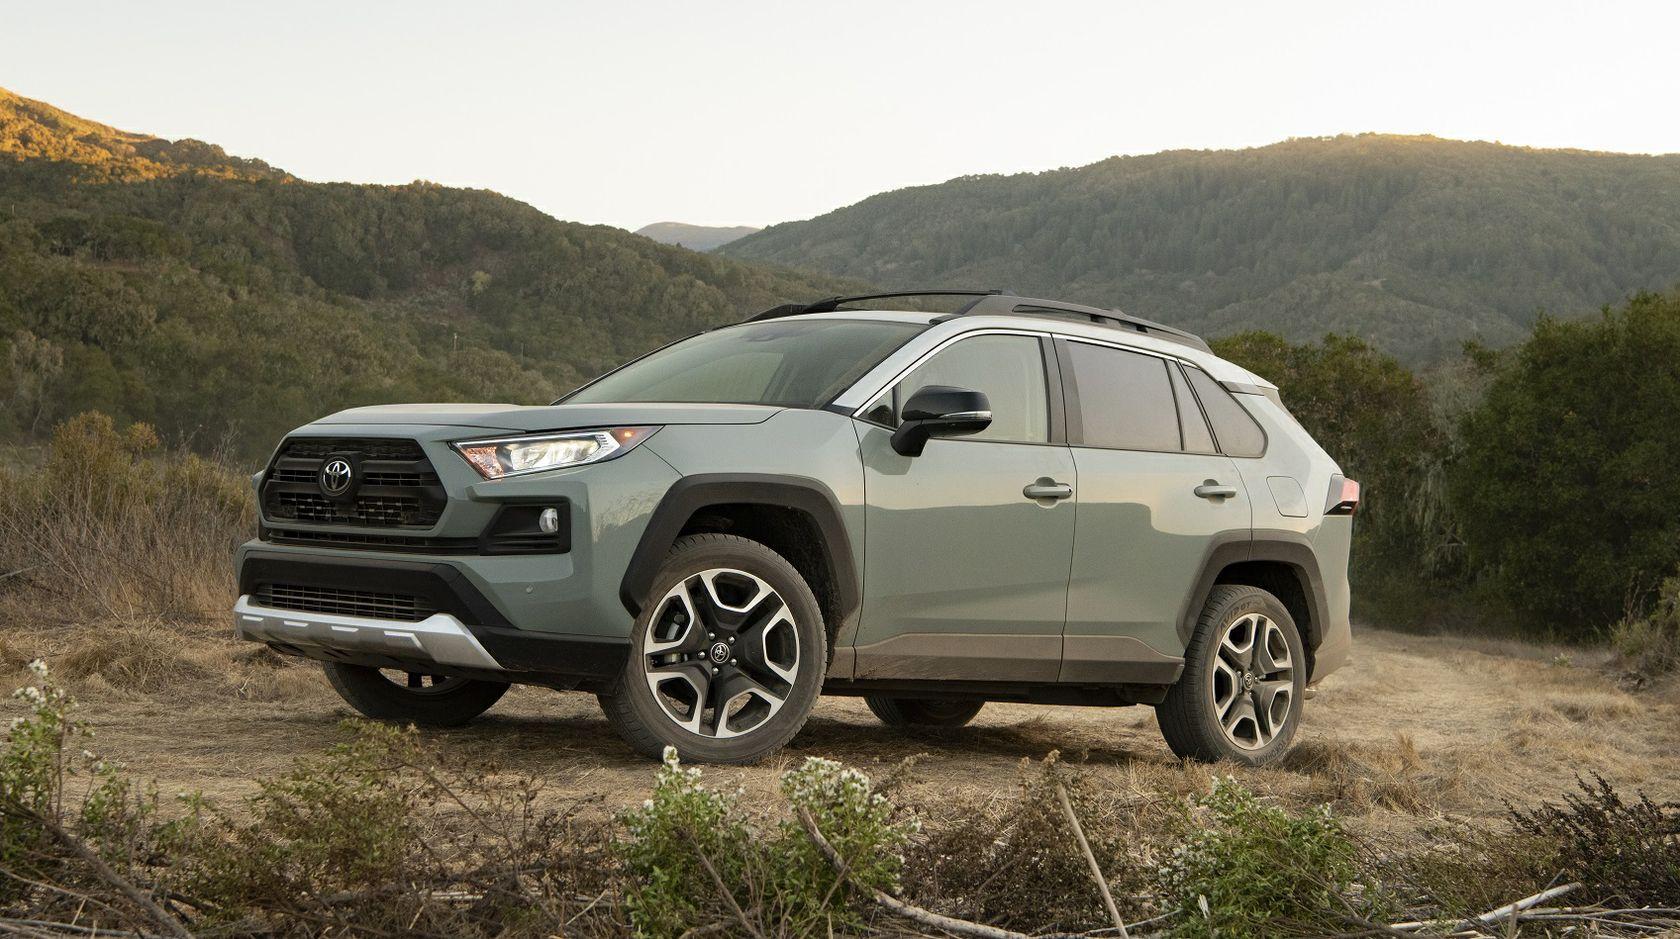 Rav4 Design Adding Excitement To The Segment Toyota Canada